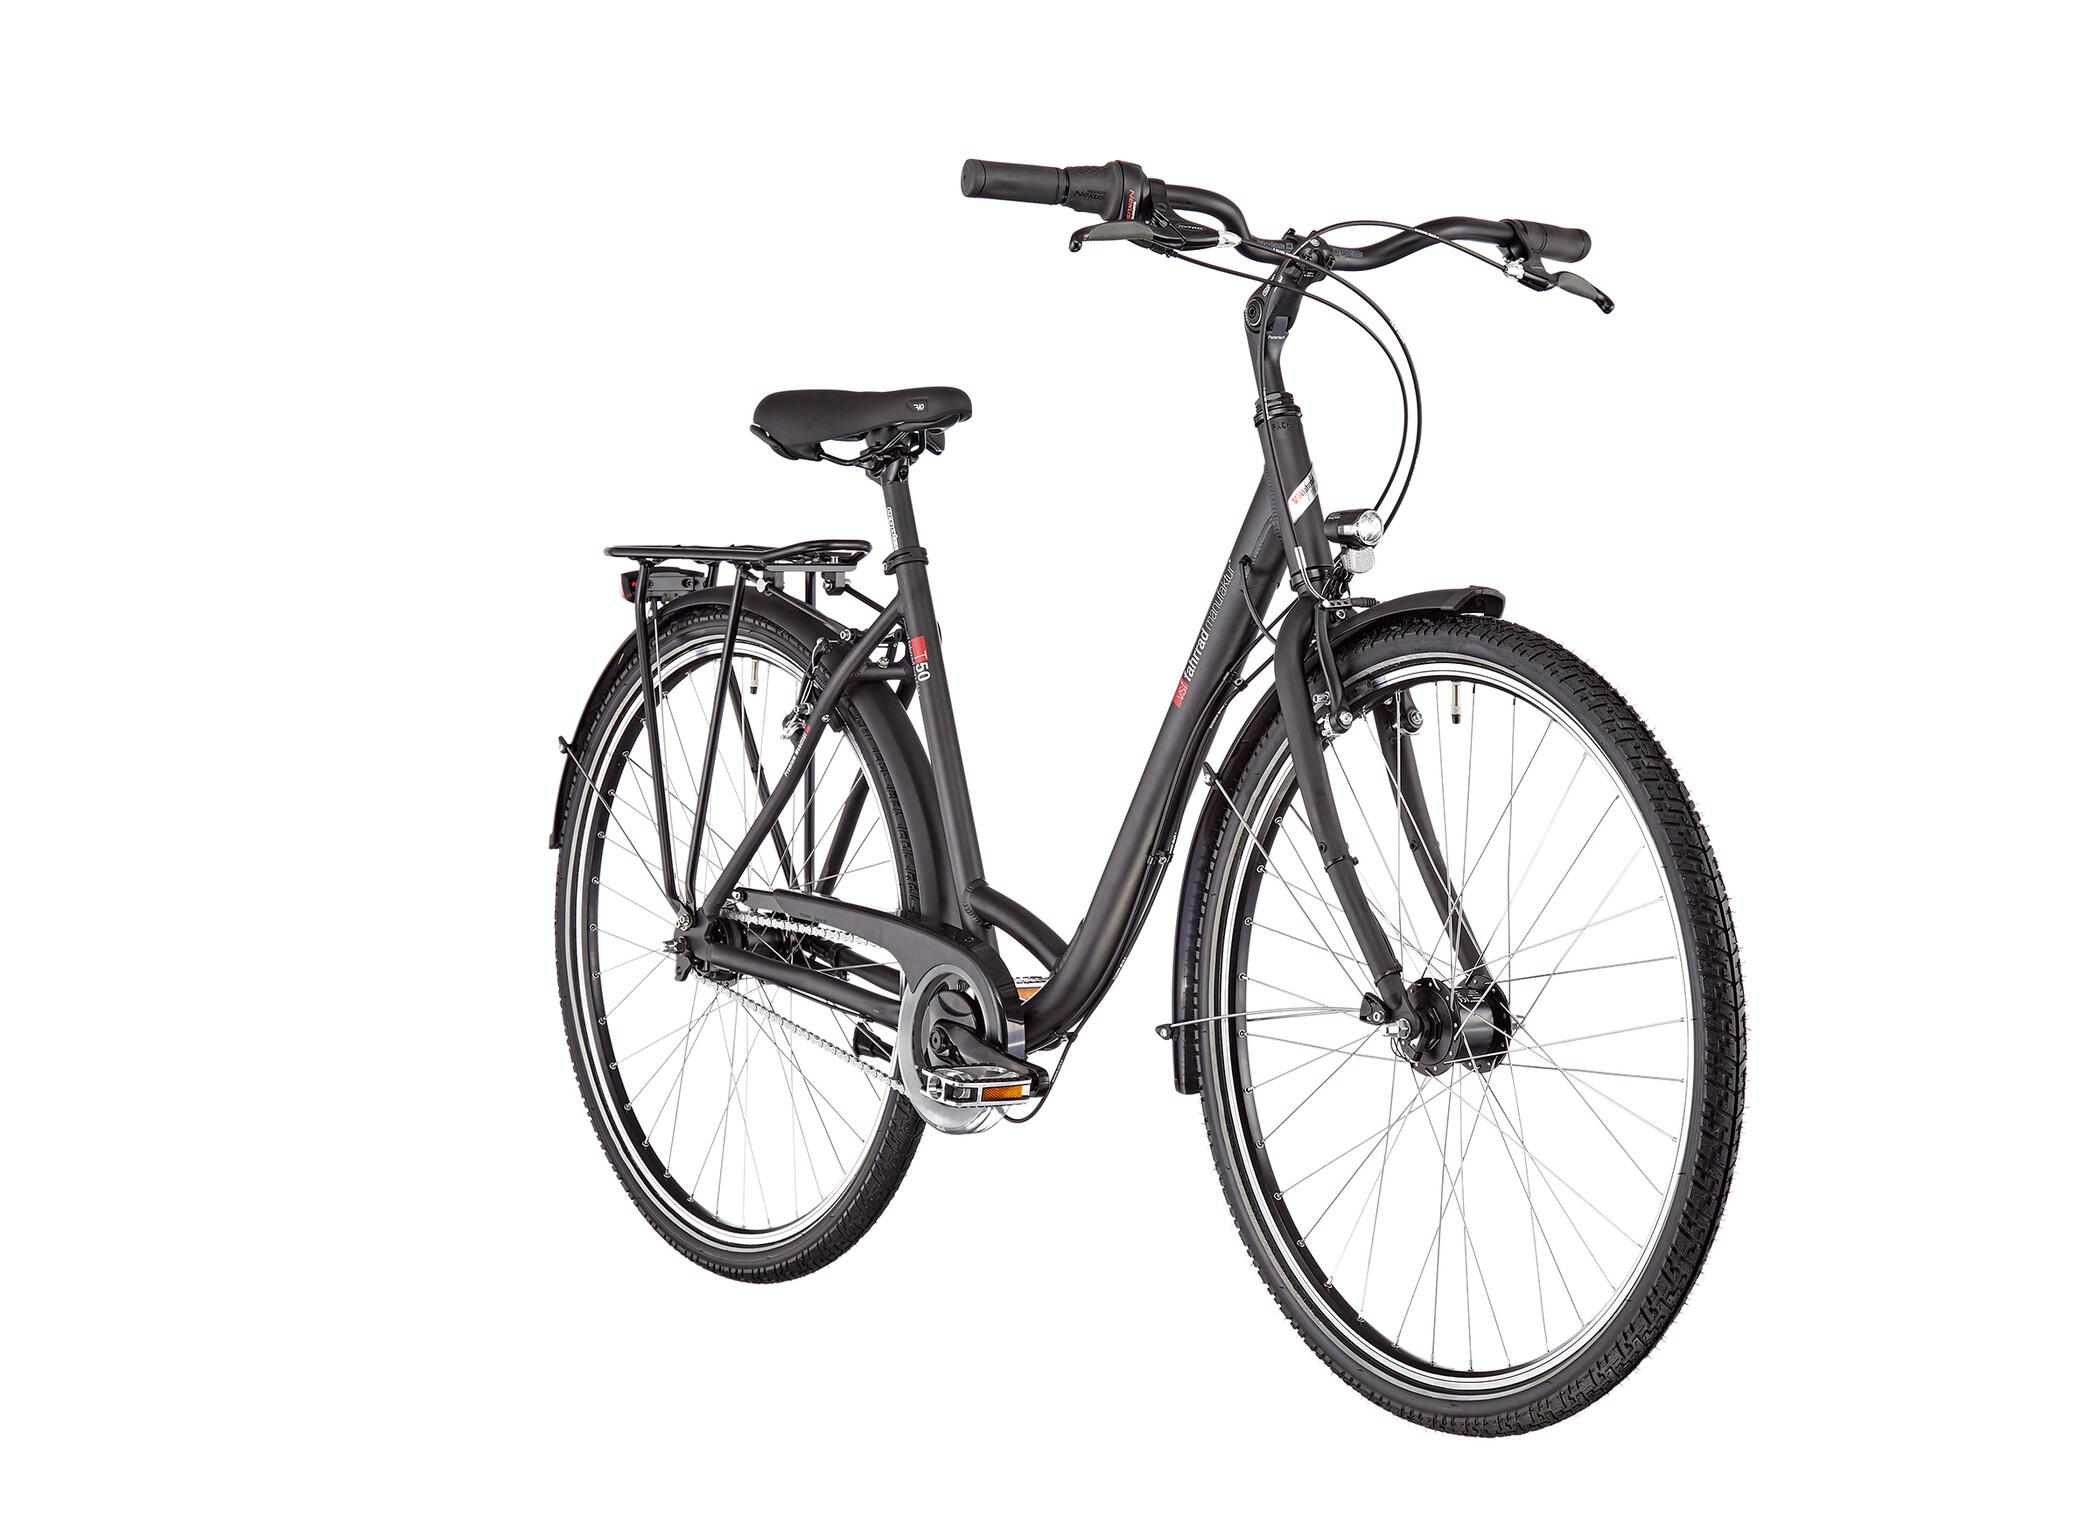 V Brakes Fahrrad und Felgenbremse online bestellen